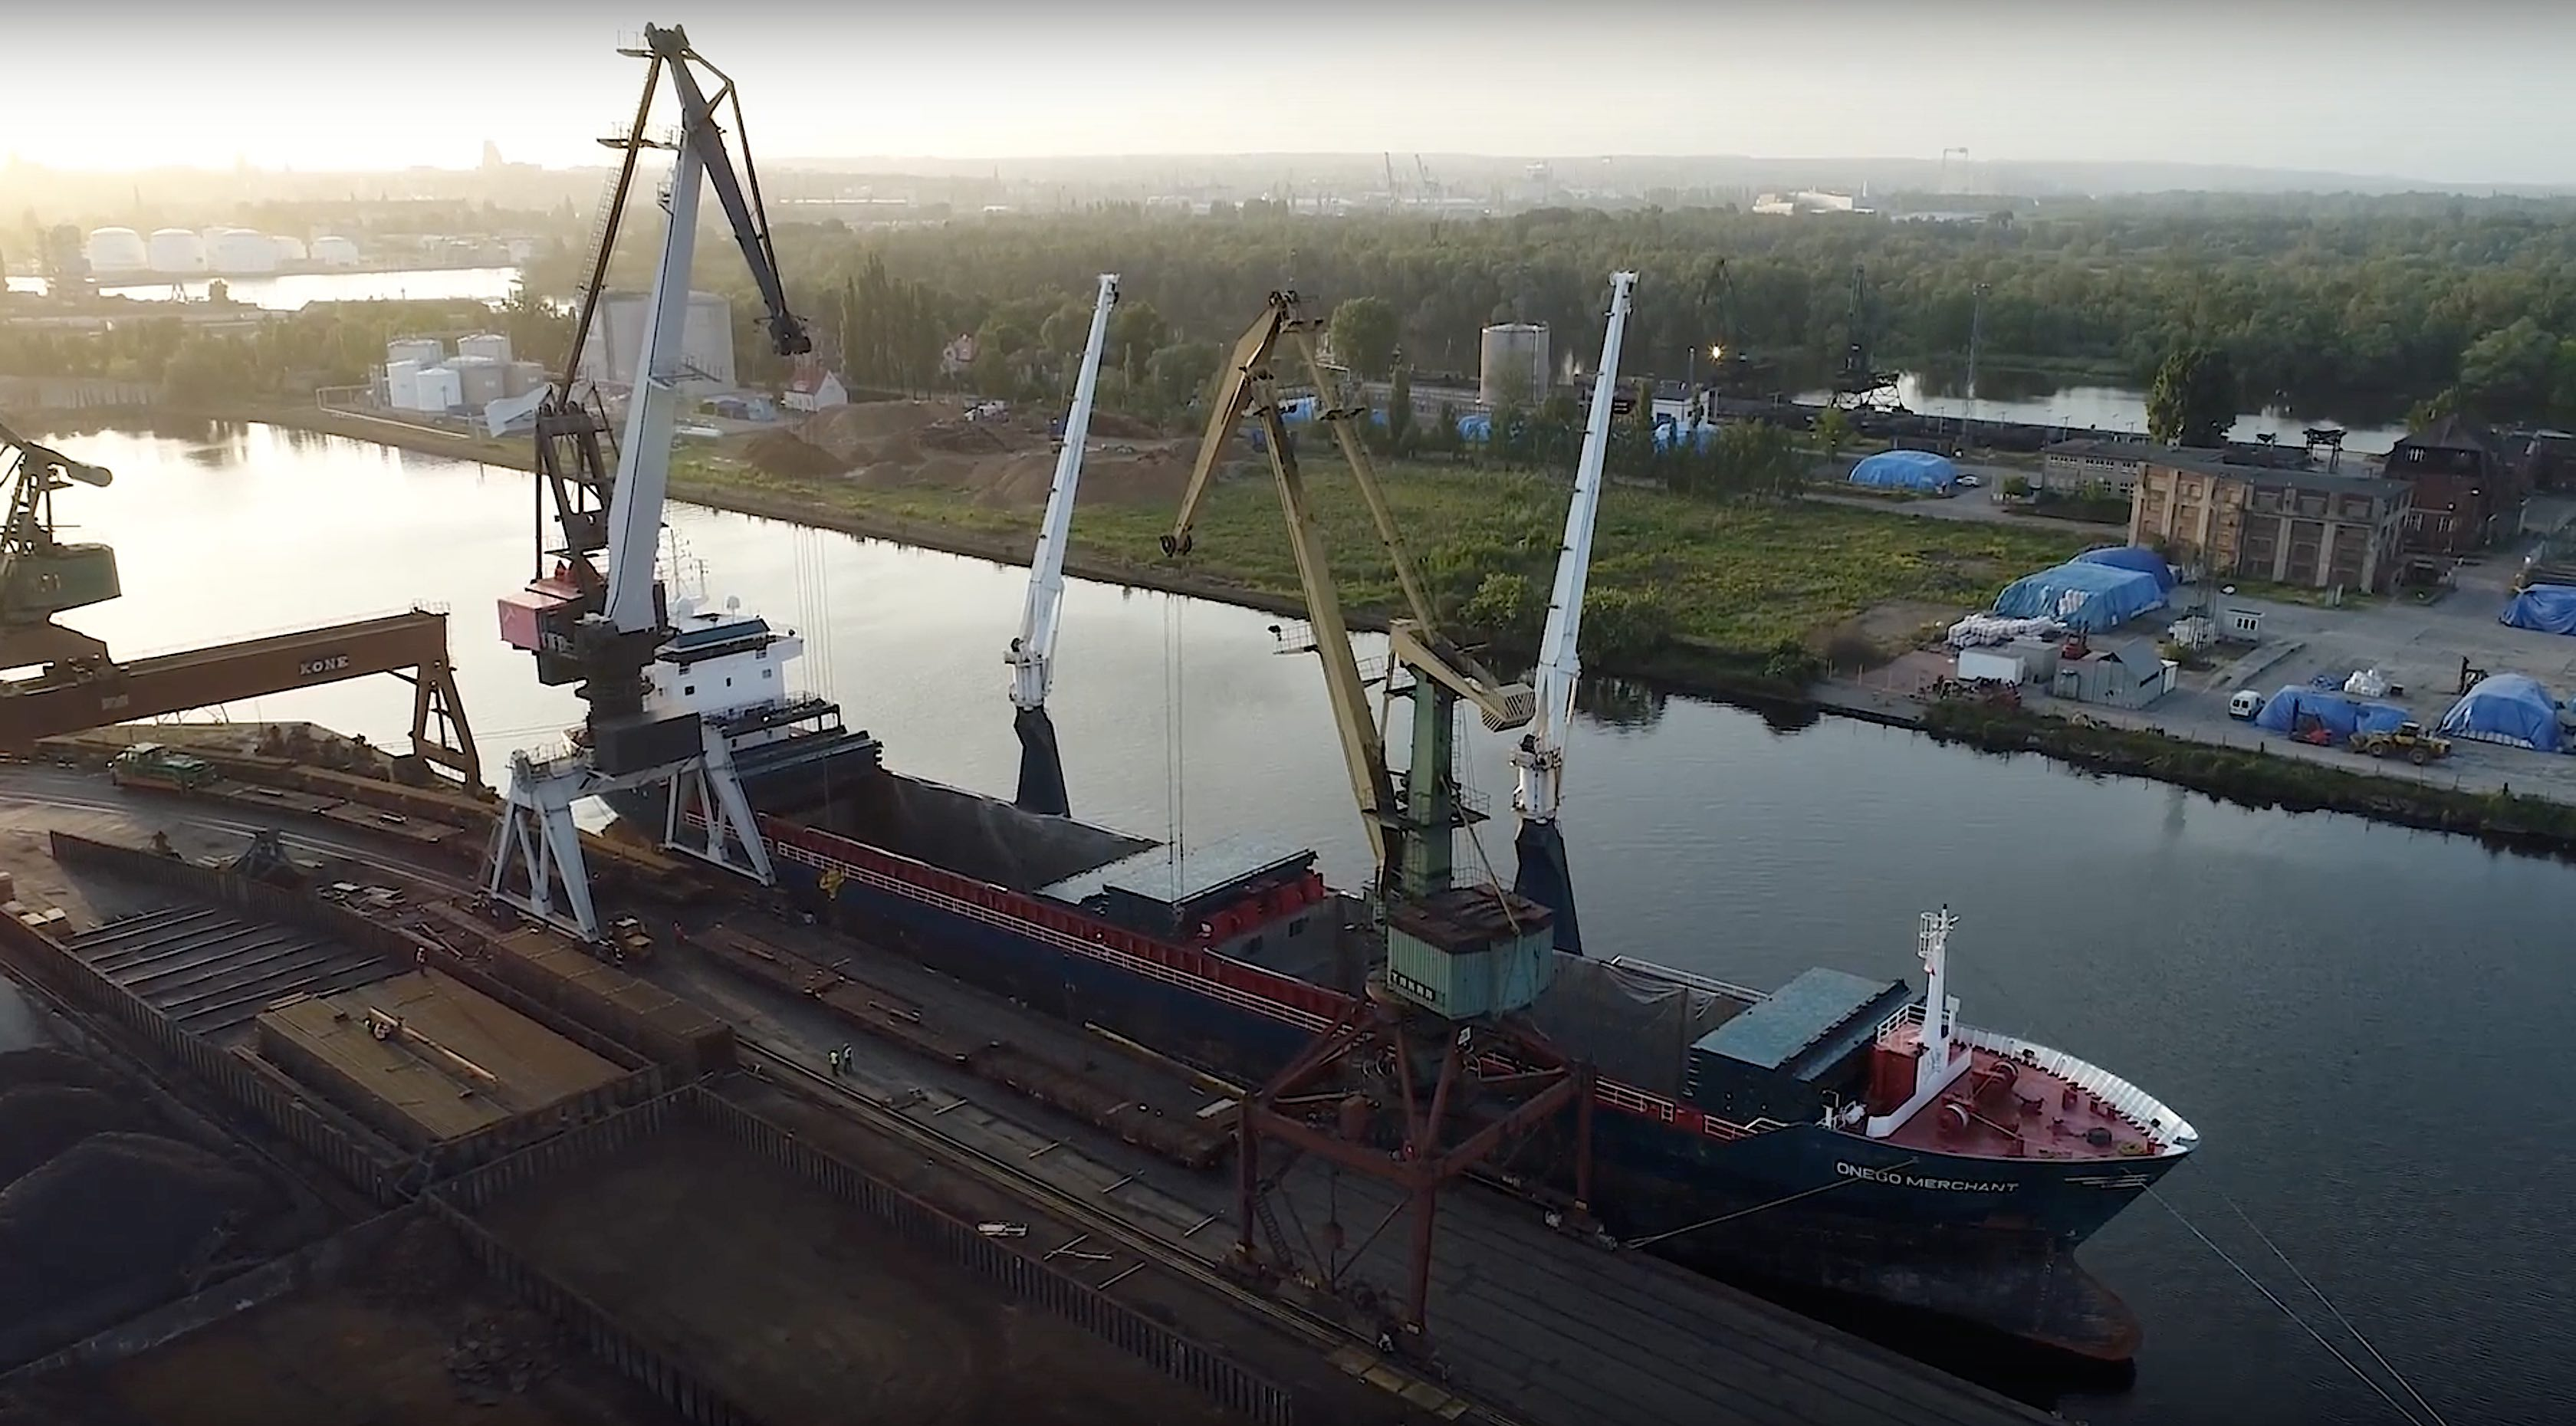 Polish Szczecin is top bulk terminal in new BIMCO report